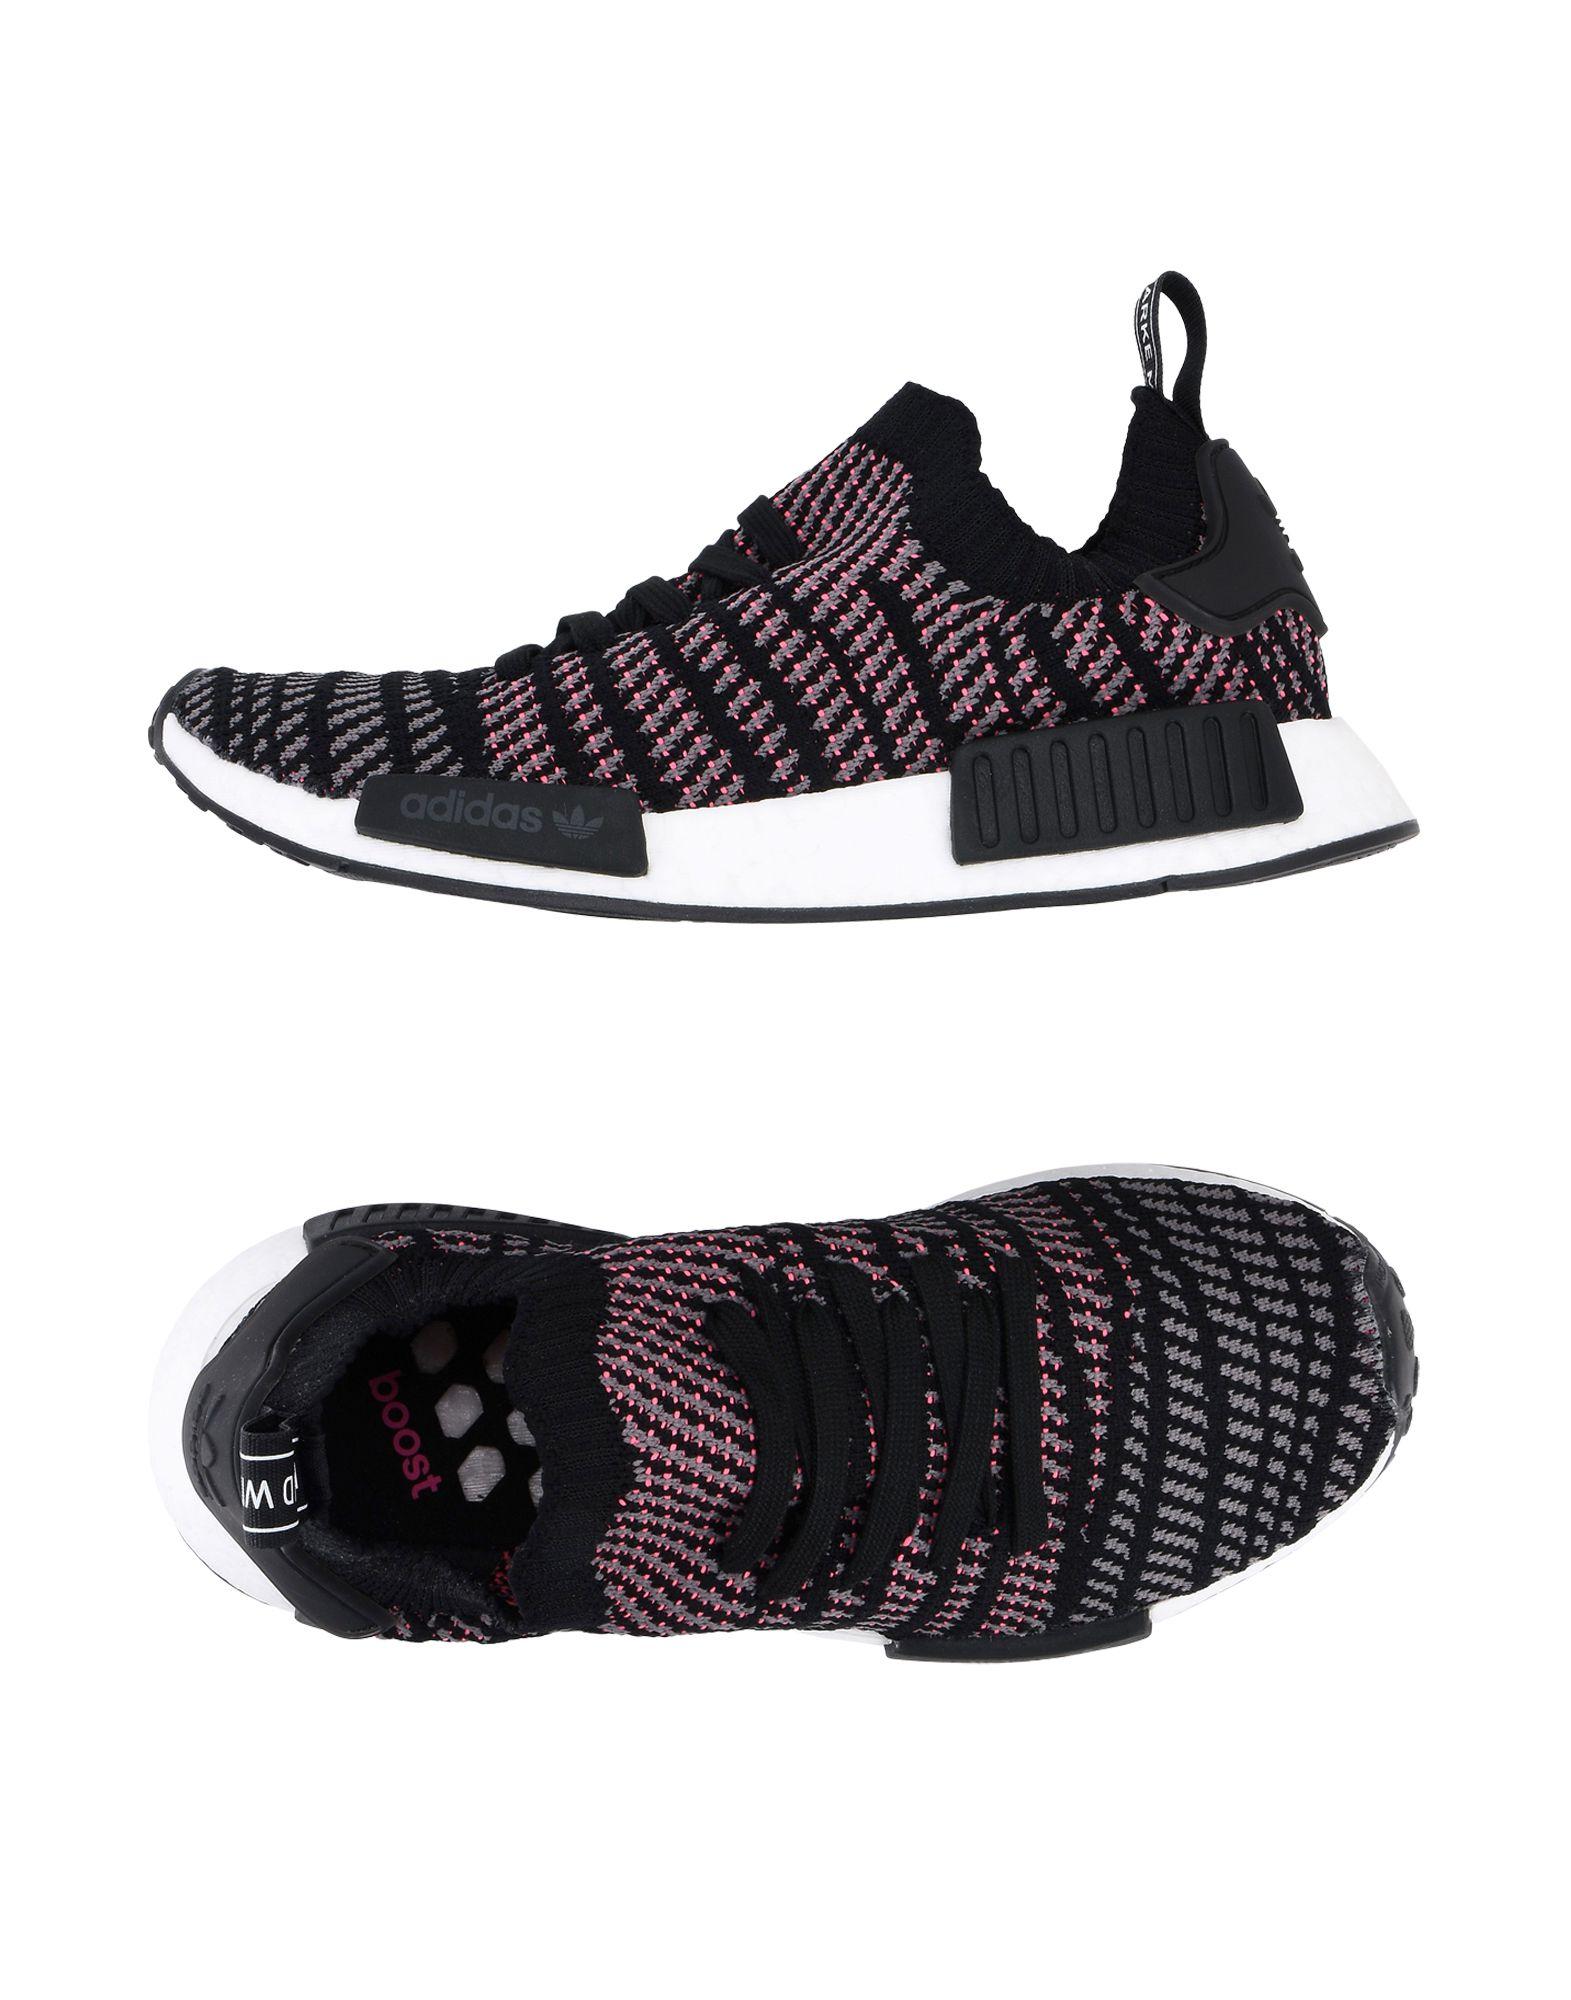 Sneakers Adidas Originals Nmd_R1 Stlt Pk - Femme - Sneakers Adidas Originals sur